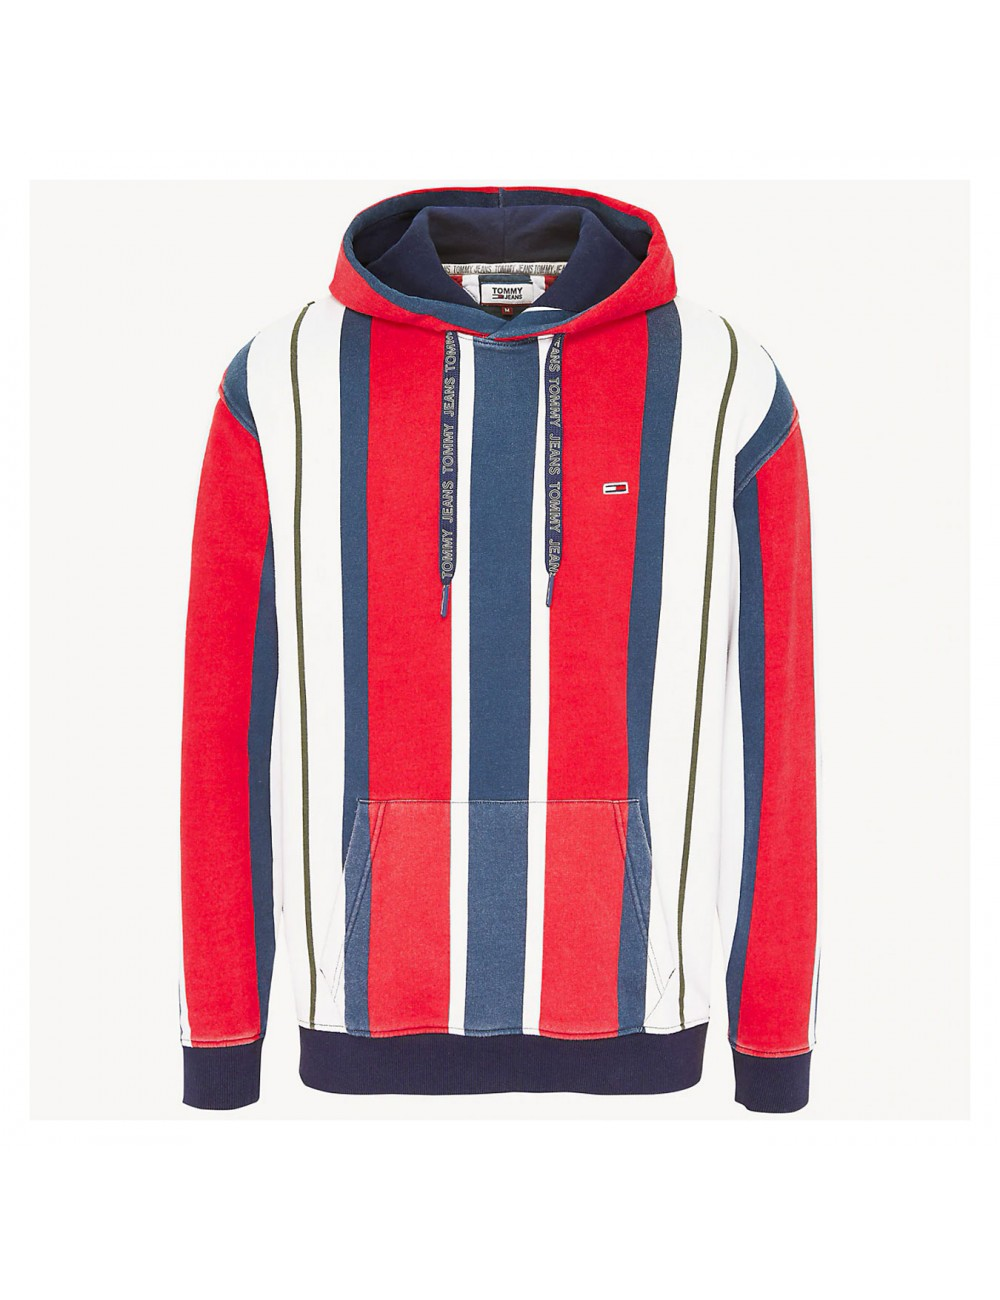 Tommy hilfiger Tjm vertical stripe hoodie - DM0DM06585667 | Shapestore.it